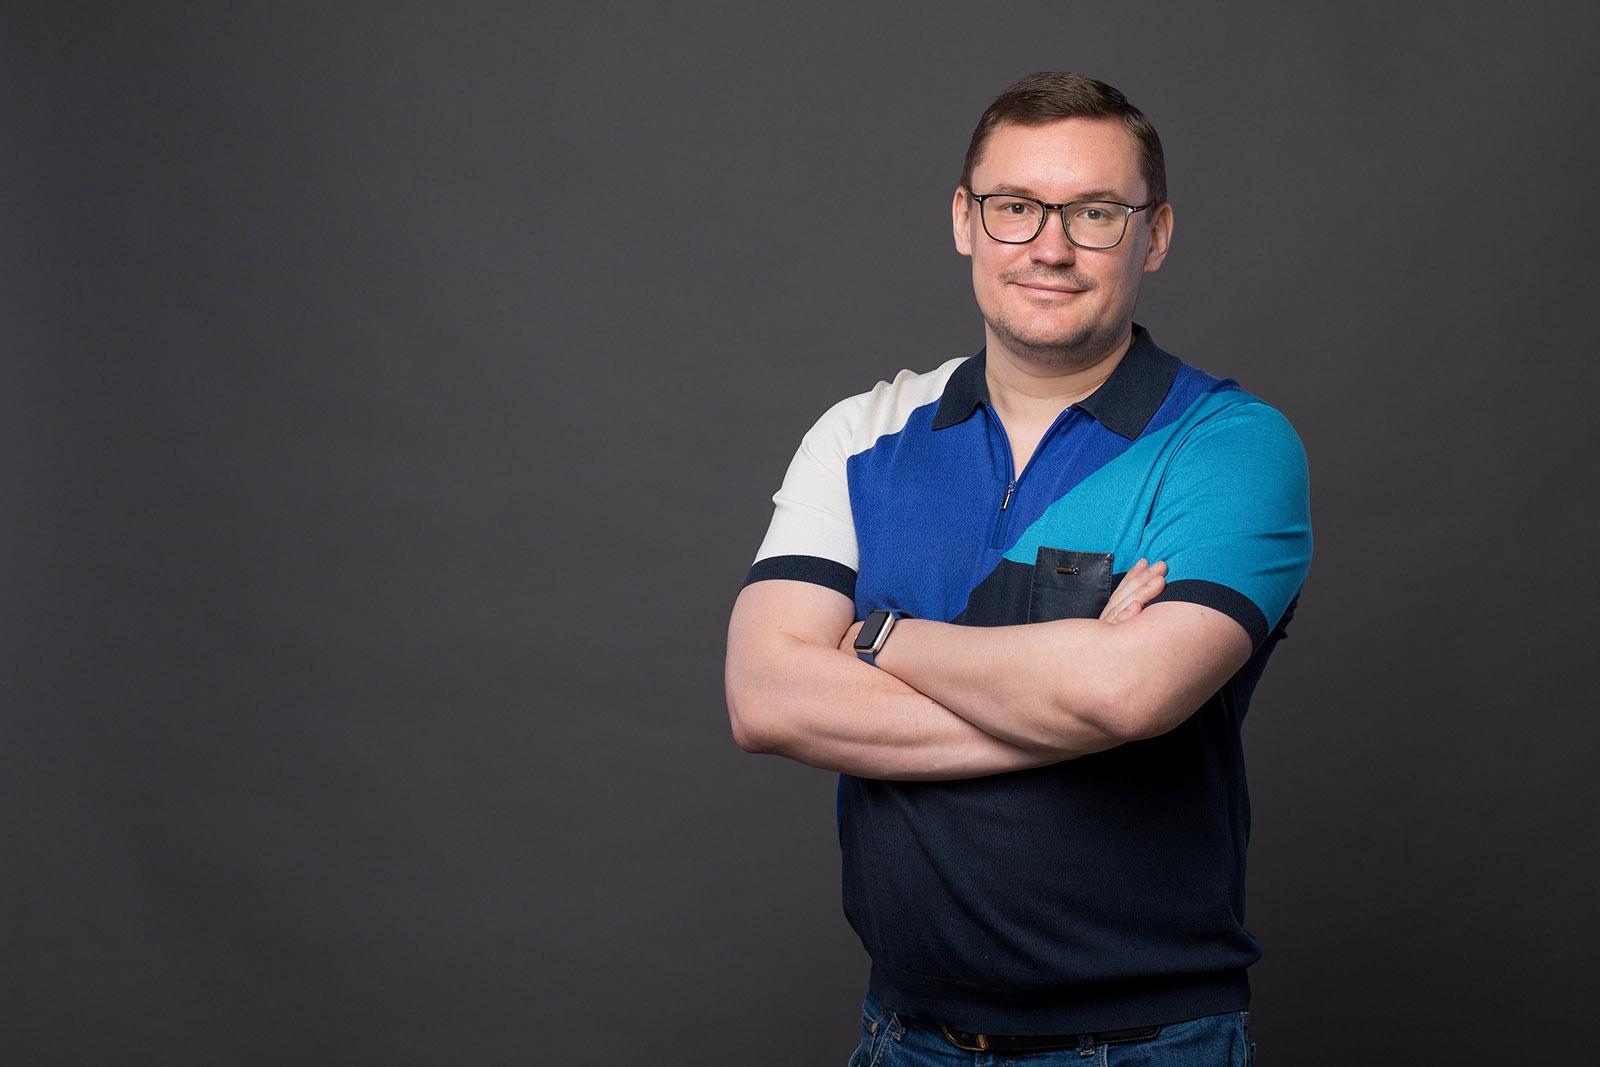 Игорь Еремин, управляющий партнер консалтингового бутика Take IT Easy